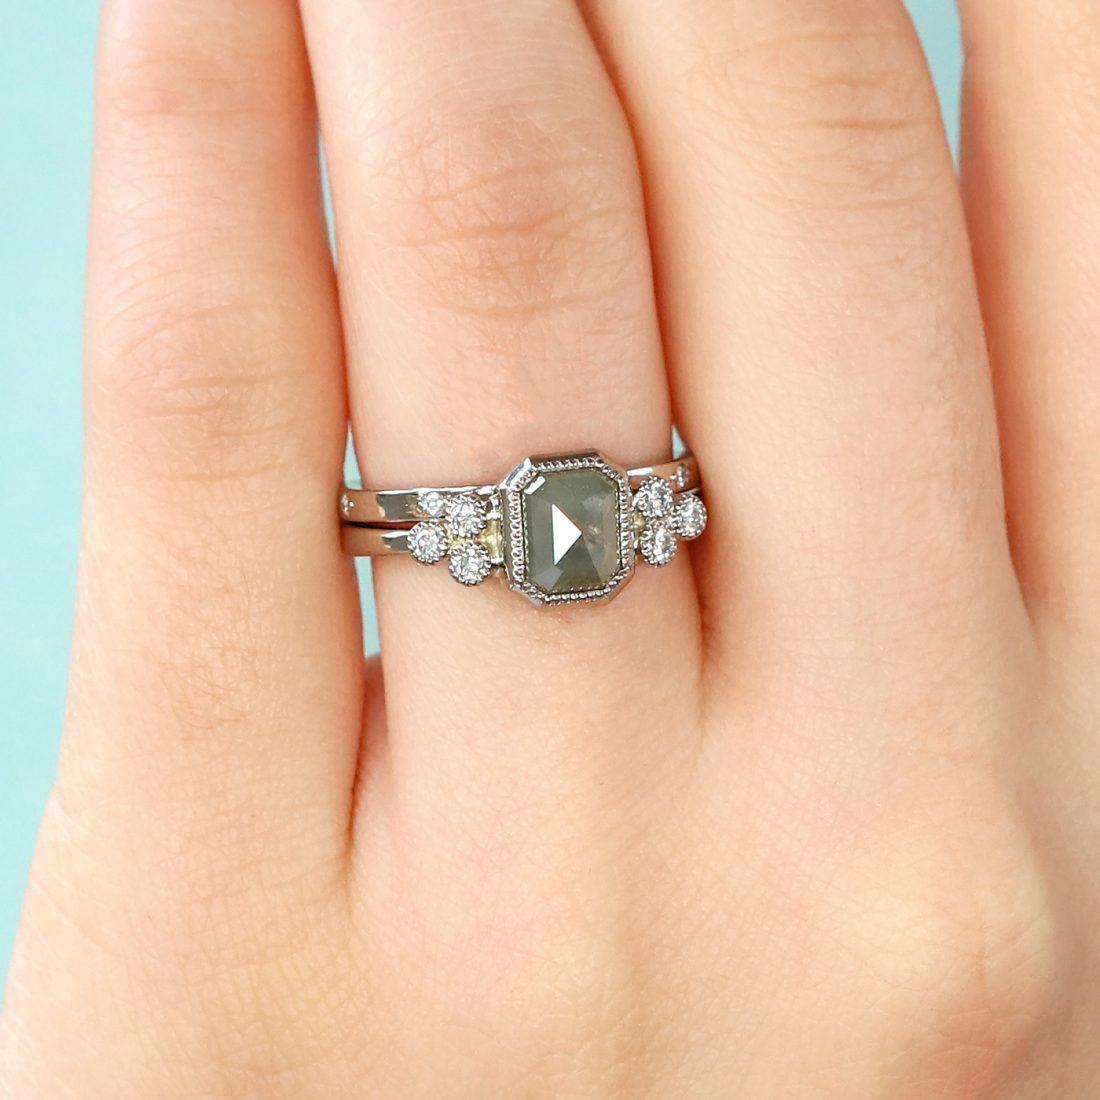 18ct White Gold Emerald Shape, Rose Cut Diamond Engagement Ring